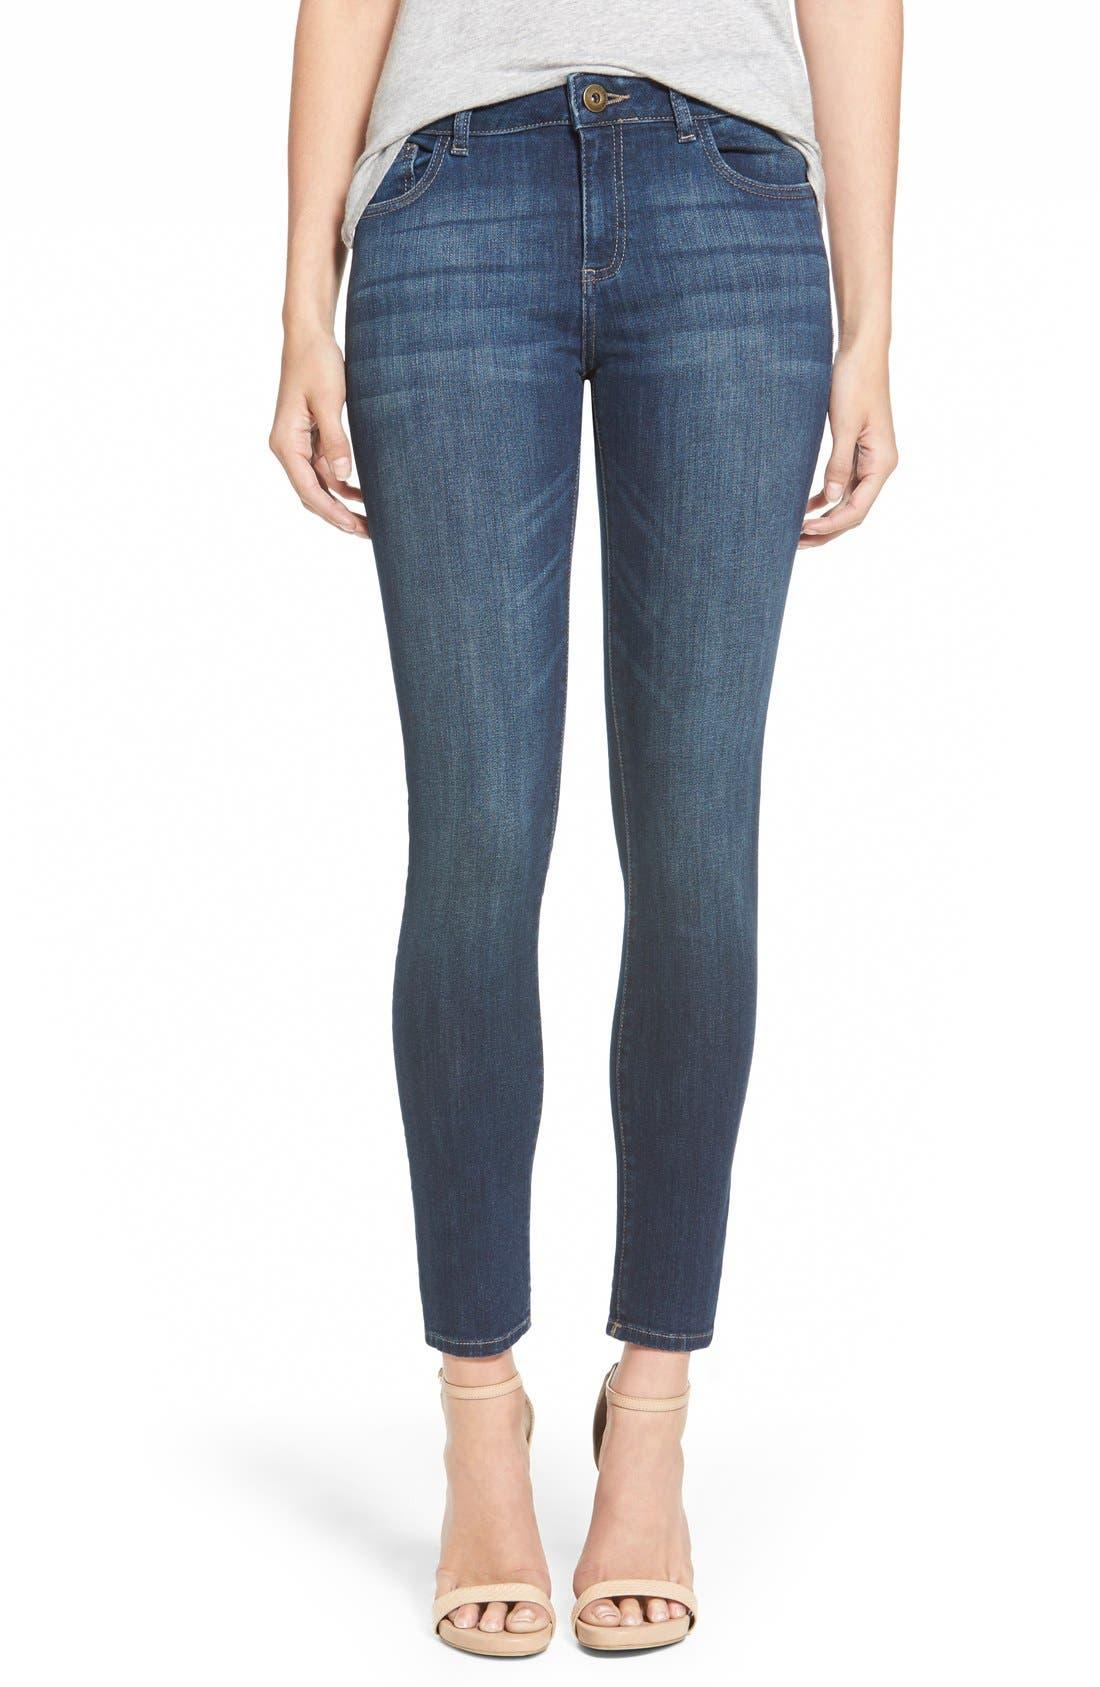 Alternate Image 1 Selected - DL1961 'Margaux' Instasculpt Ankle Skinny Jeans (Winter)